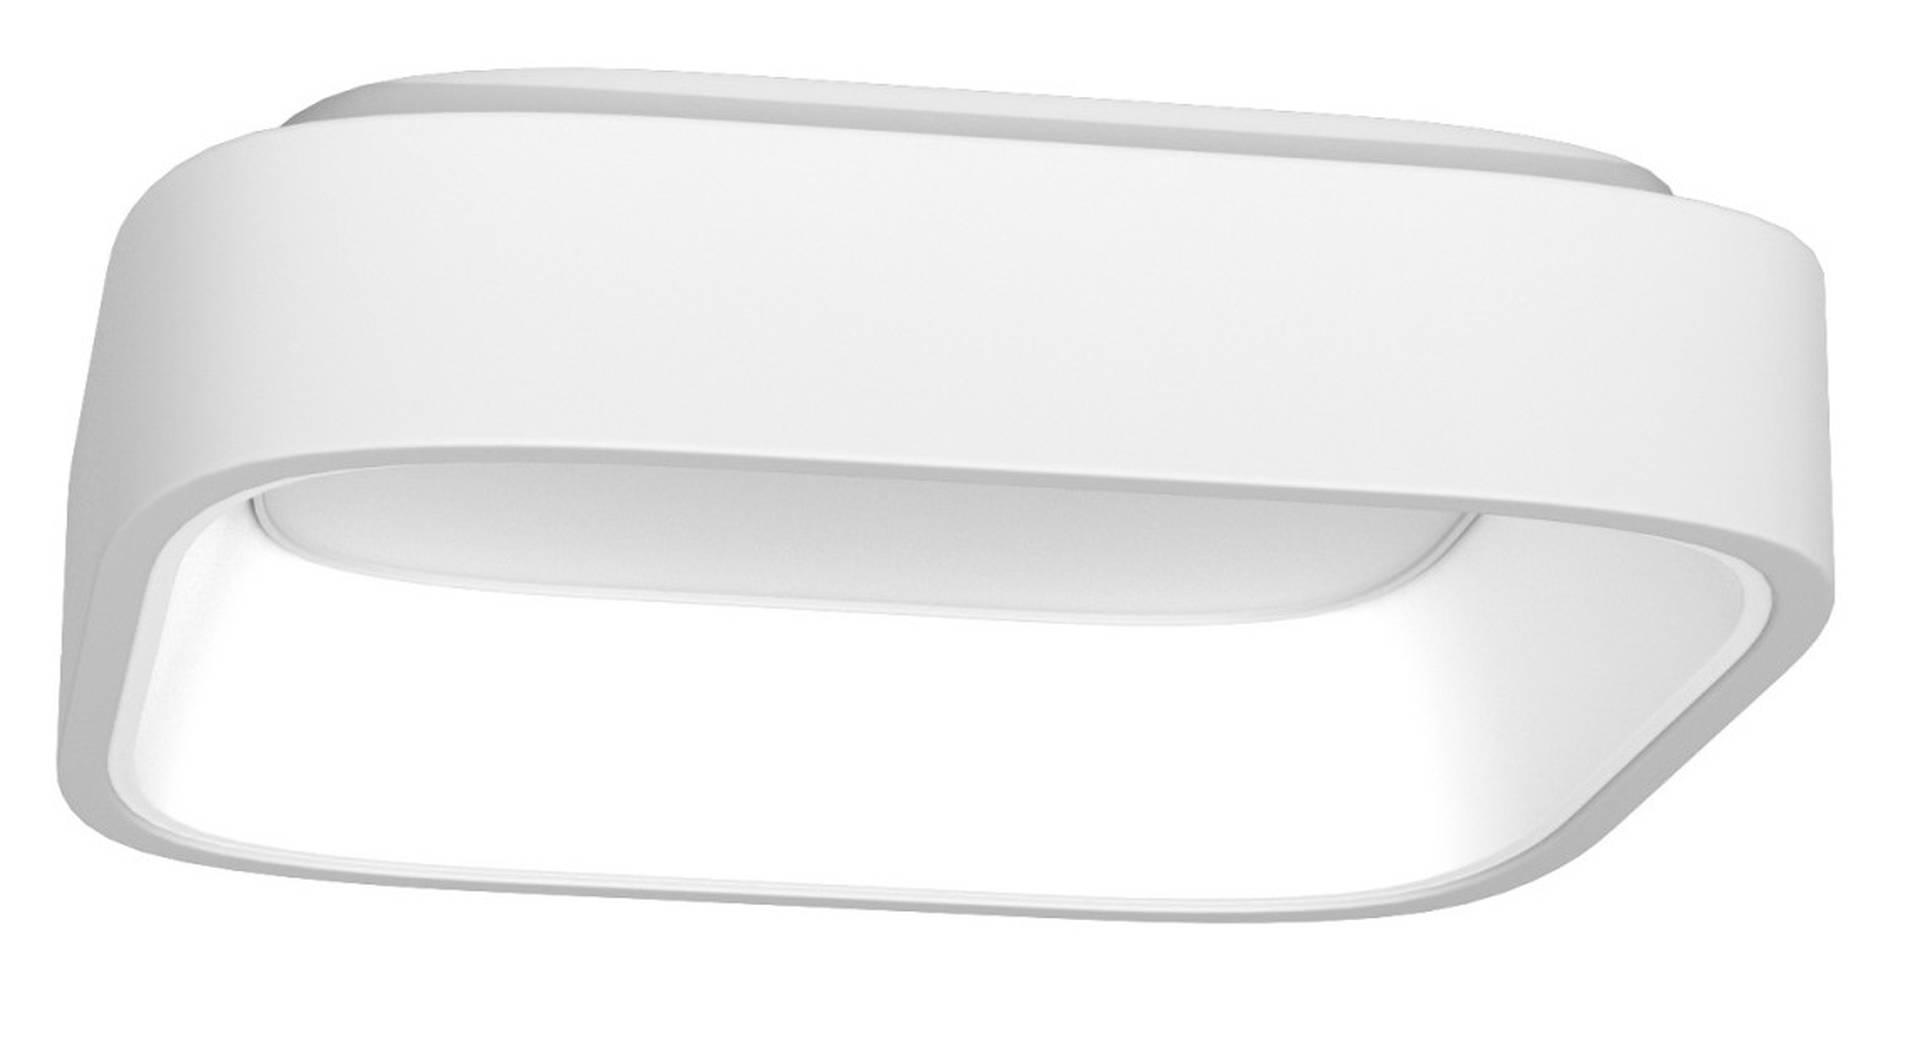 Immax Biele SMART stropné svietidlo hranaté 47W 60cm